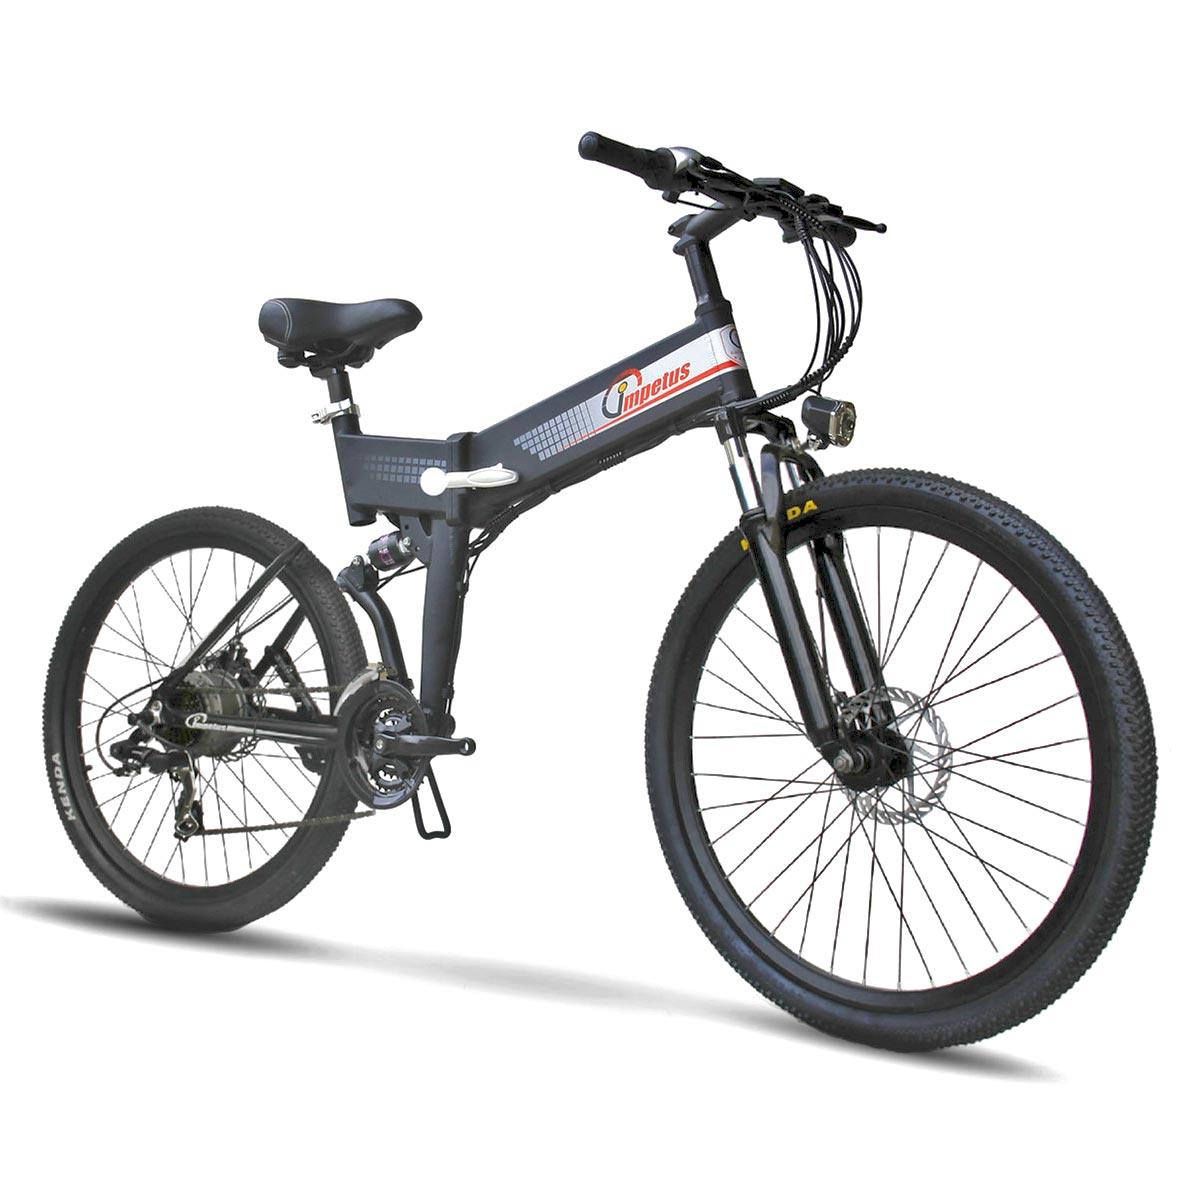 Bicicleta Electrica Ares – Impetus (Plegable)